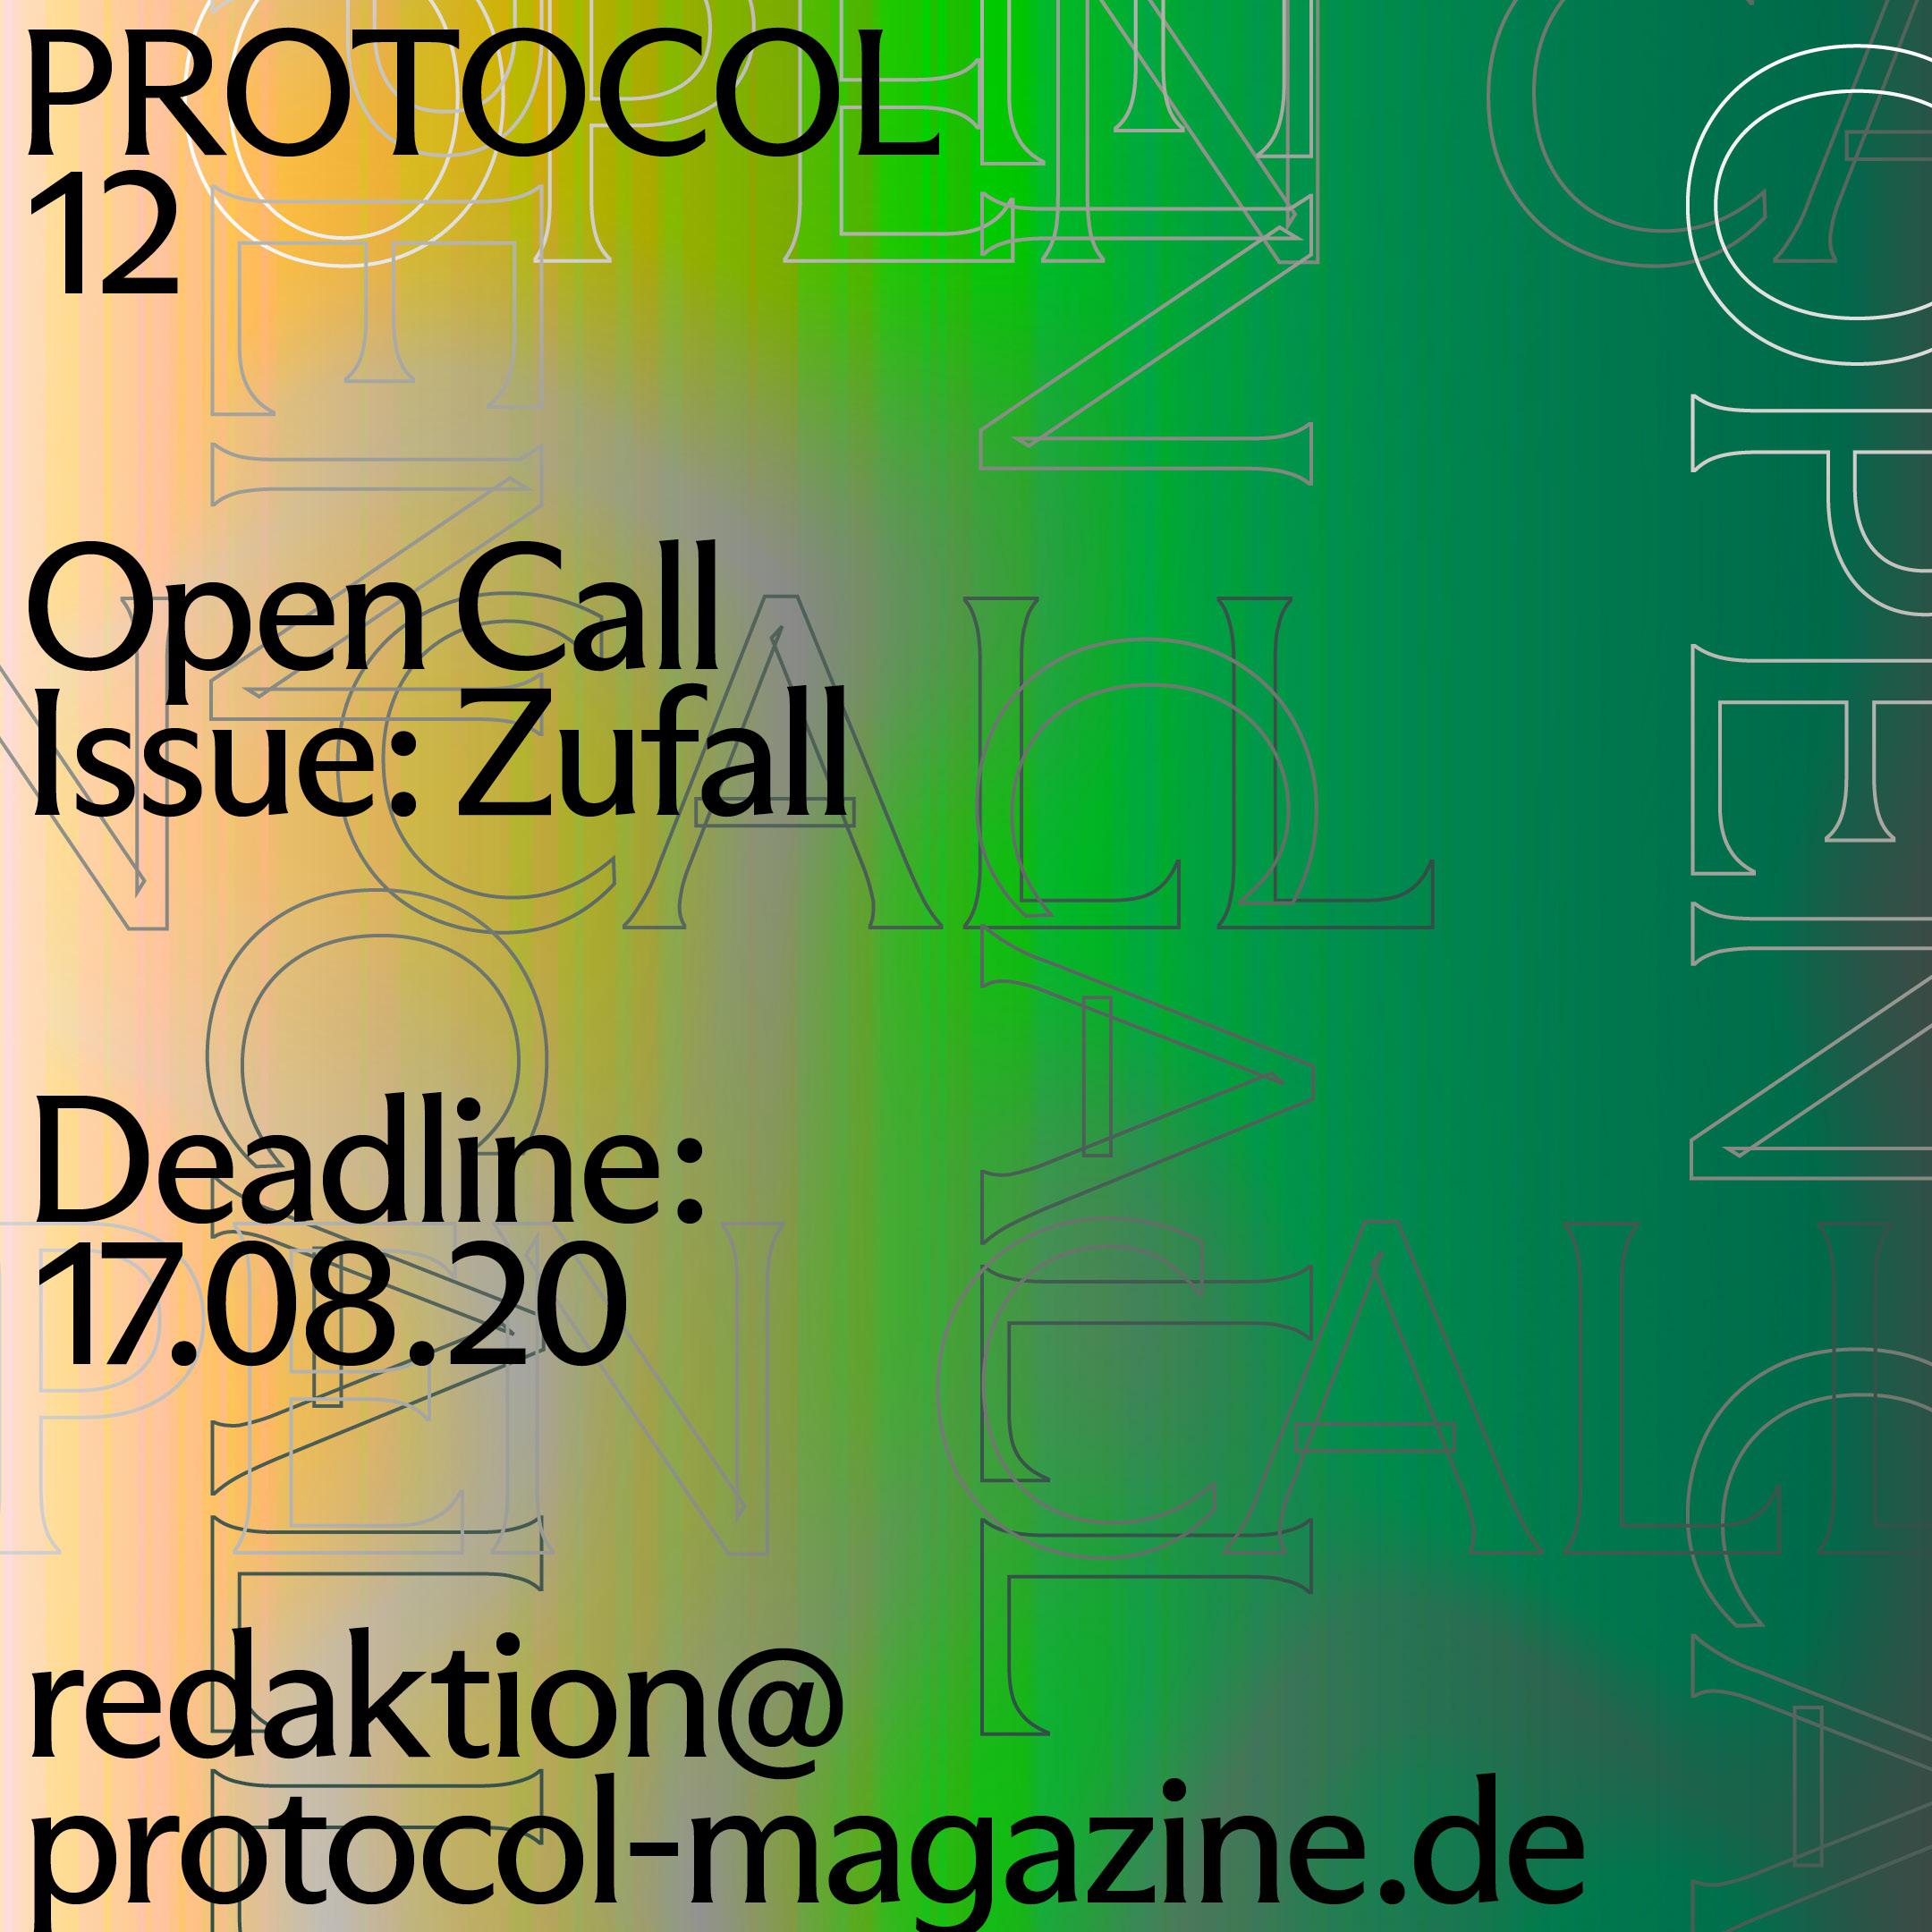 p12_Instagram-Redaktion_Protocol-Magazin_Magazin-fuer-Architektur-im-Kontext18